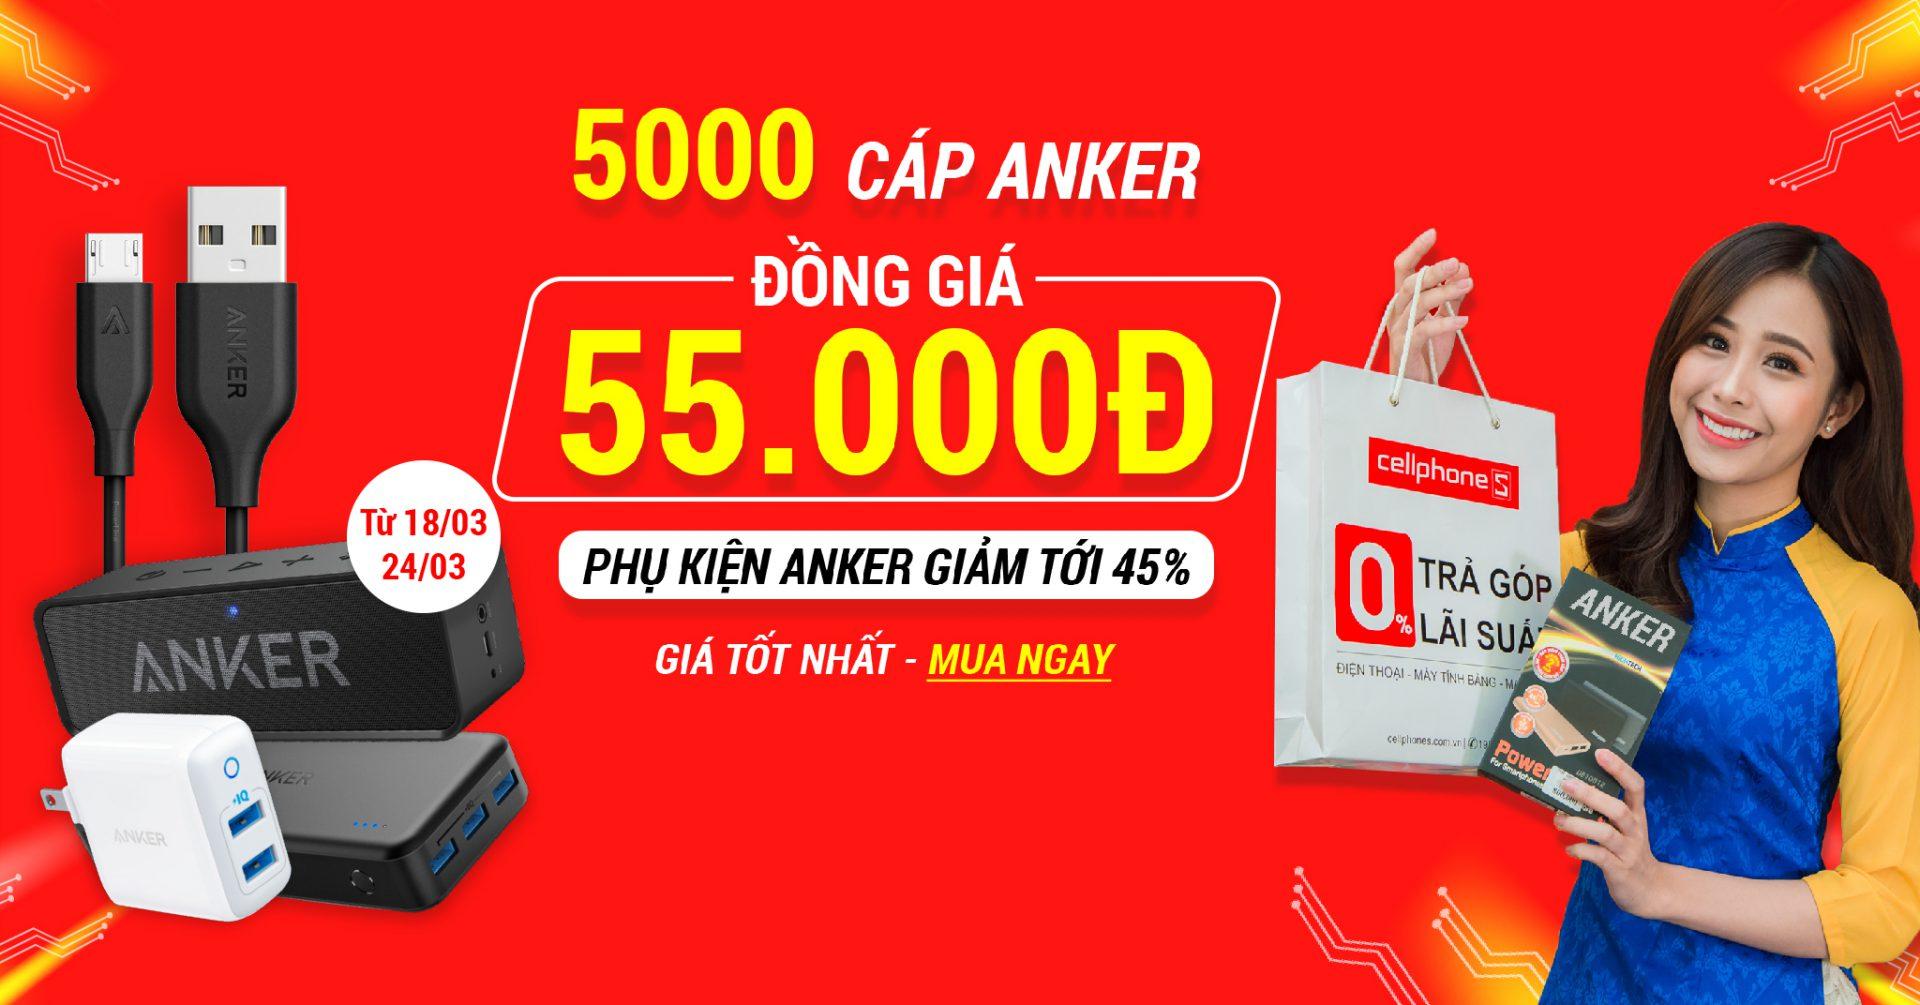 HOT !!! 5.000 cáp sạc Anker cao cấp GIẢM SỐC 45% tại CellphoneS